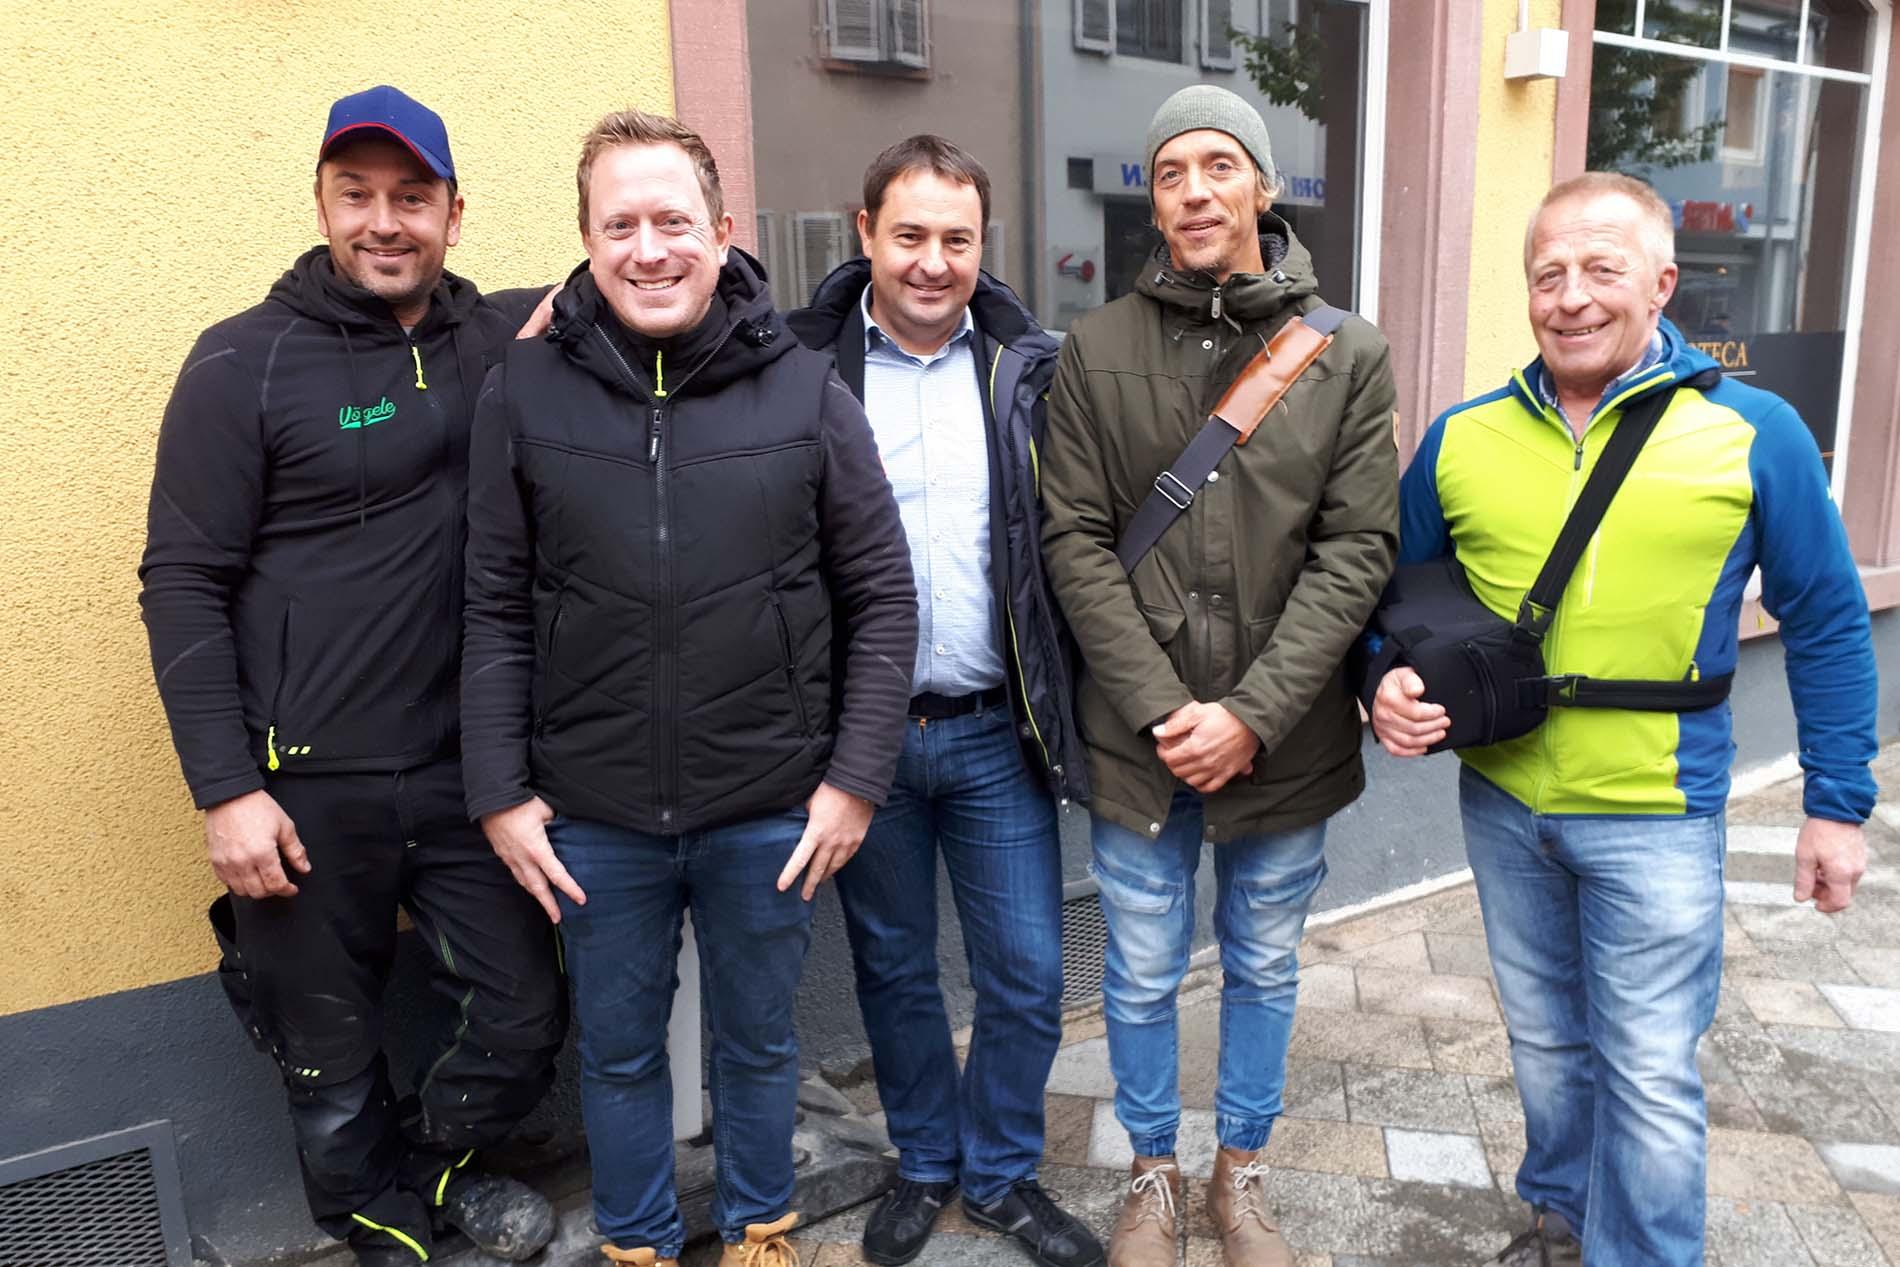 das-Baustellenteam-v.l.n.r-Markus-Kury-Dirk-Geromüller-Thomas-Wolf-David-Schlechtriem-Ottmar-Riesterer